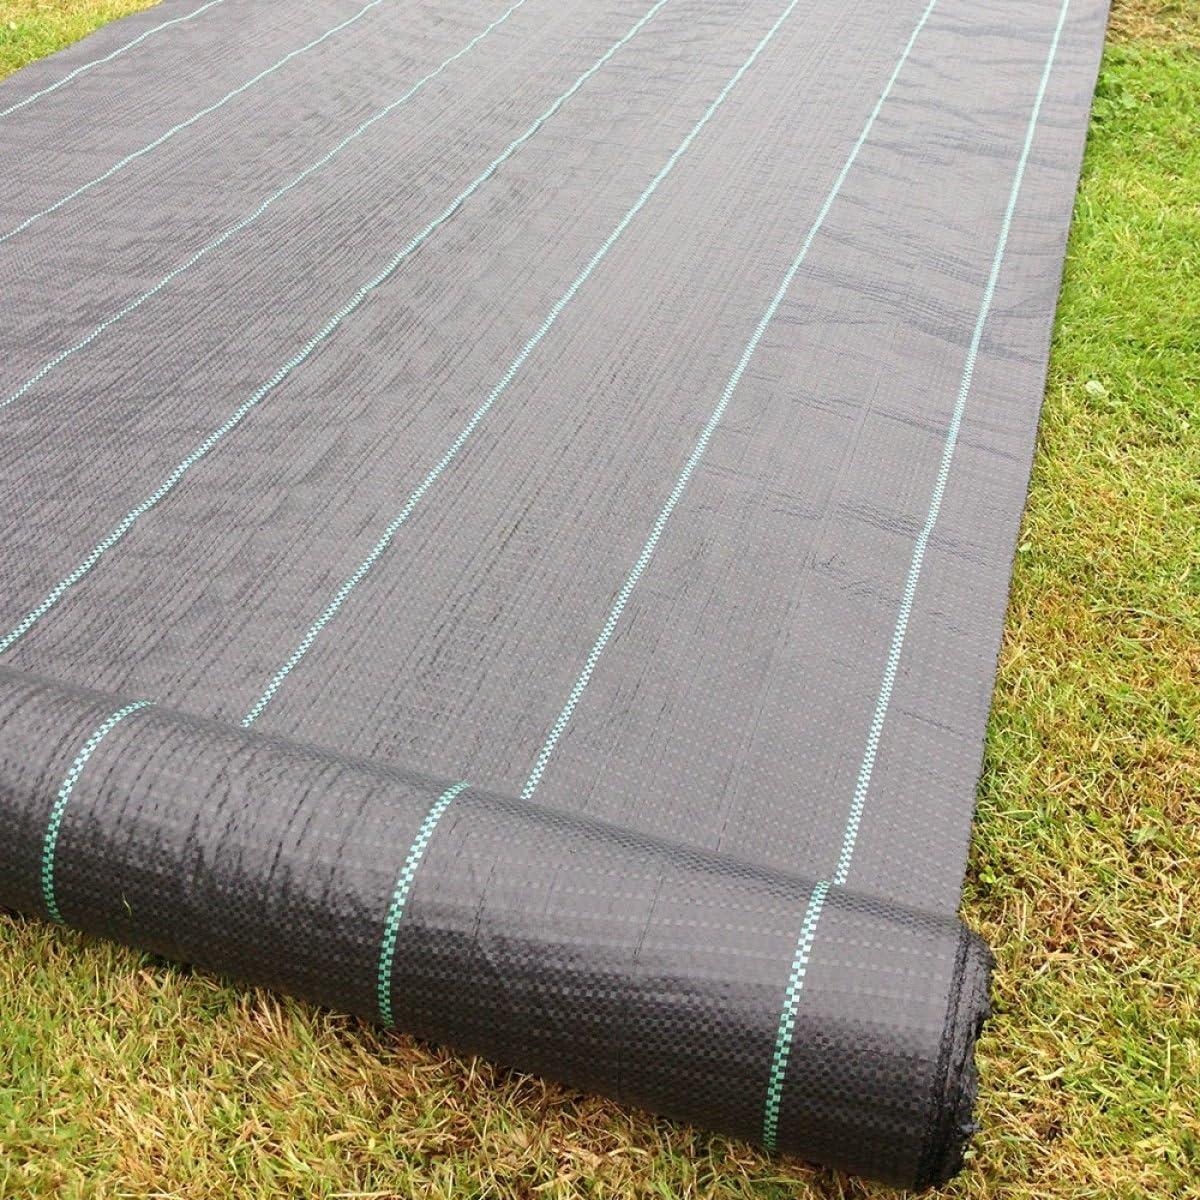 Yuzet 2m x 50m 100gsm Heavy Duty Weed Control Fabric